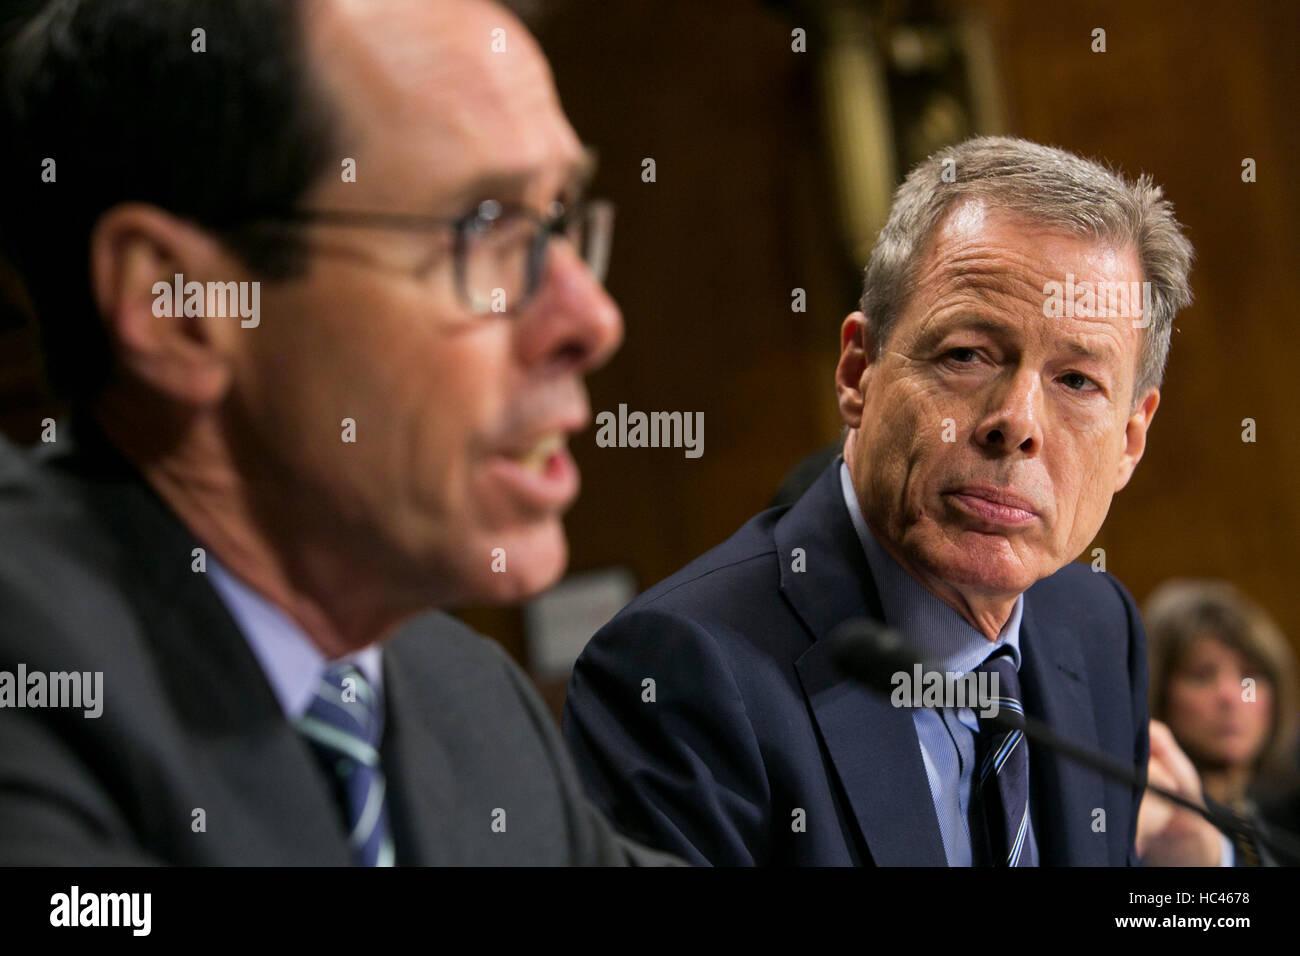 Washington DC, USA. 7th December, 2016. Randall Stephenson, Chairman & CEO of AT&T, left, and Jeffrey Bewkes, - Stock Image